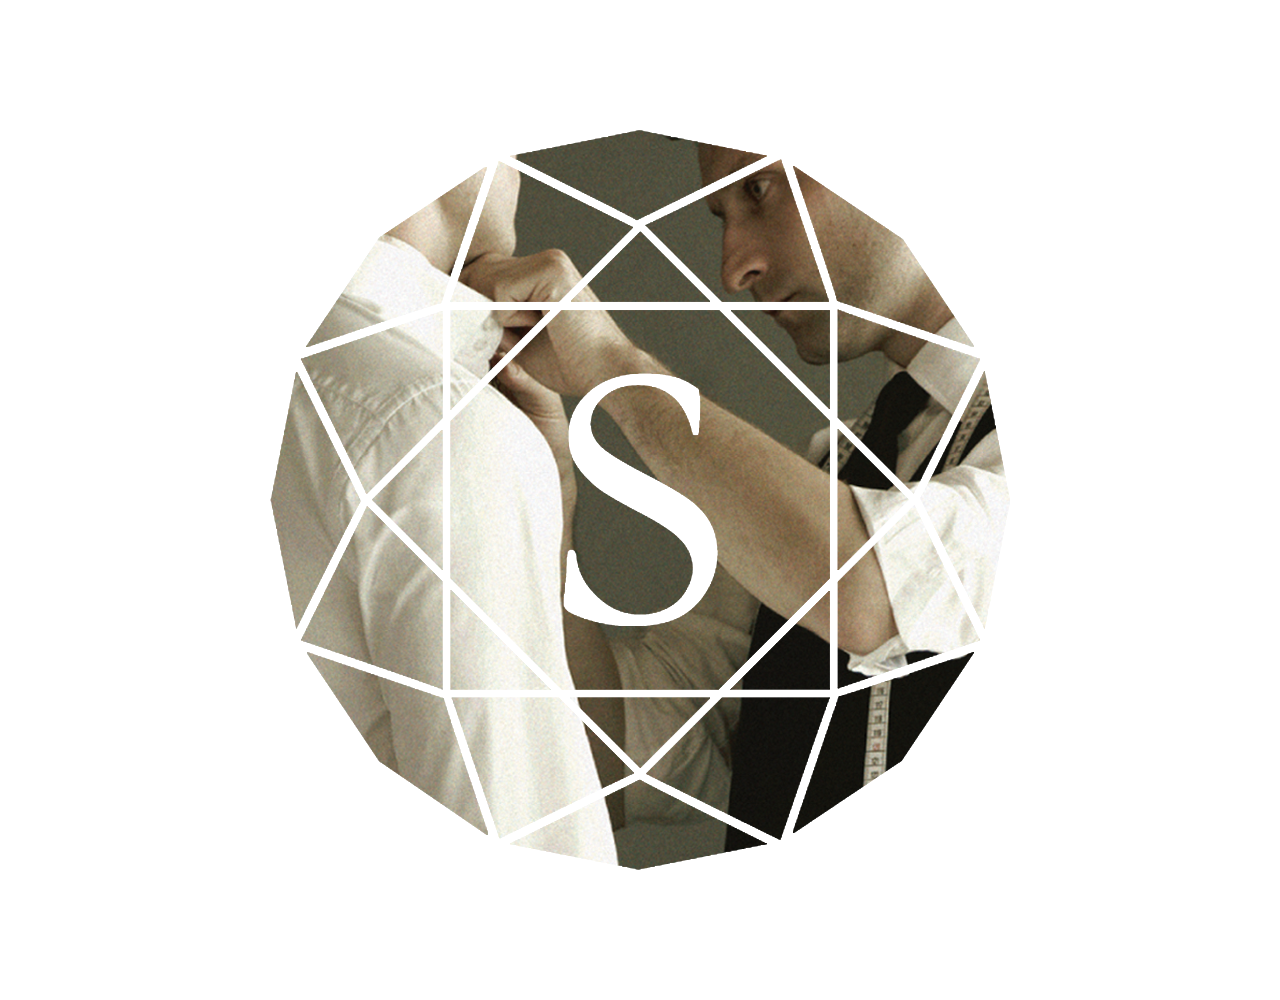 Sinemora2